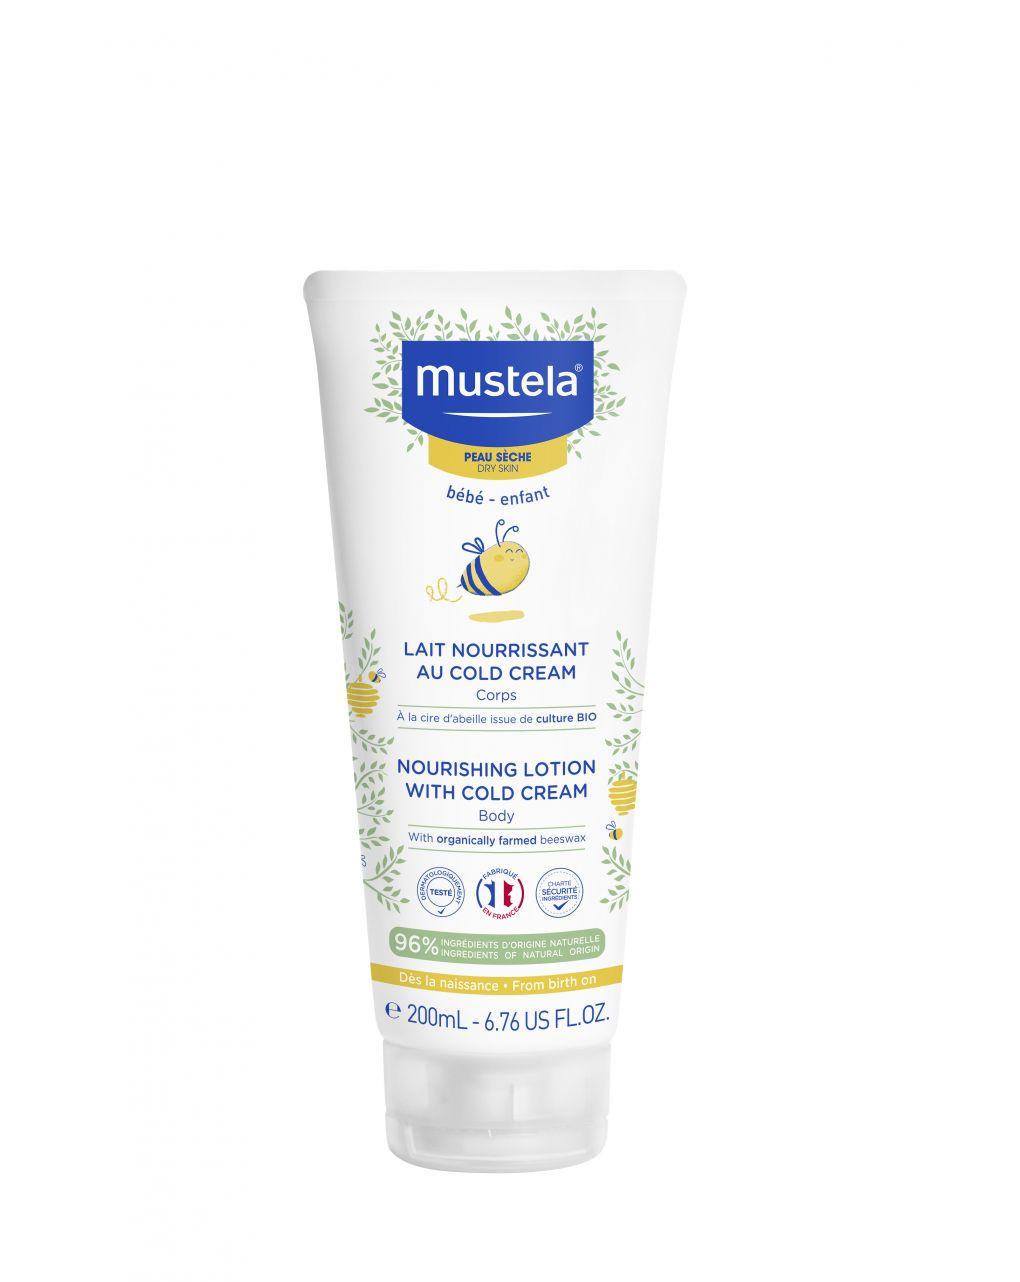 Latte nutriente alla cold cream 200ml - Mustela